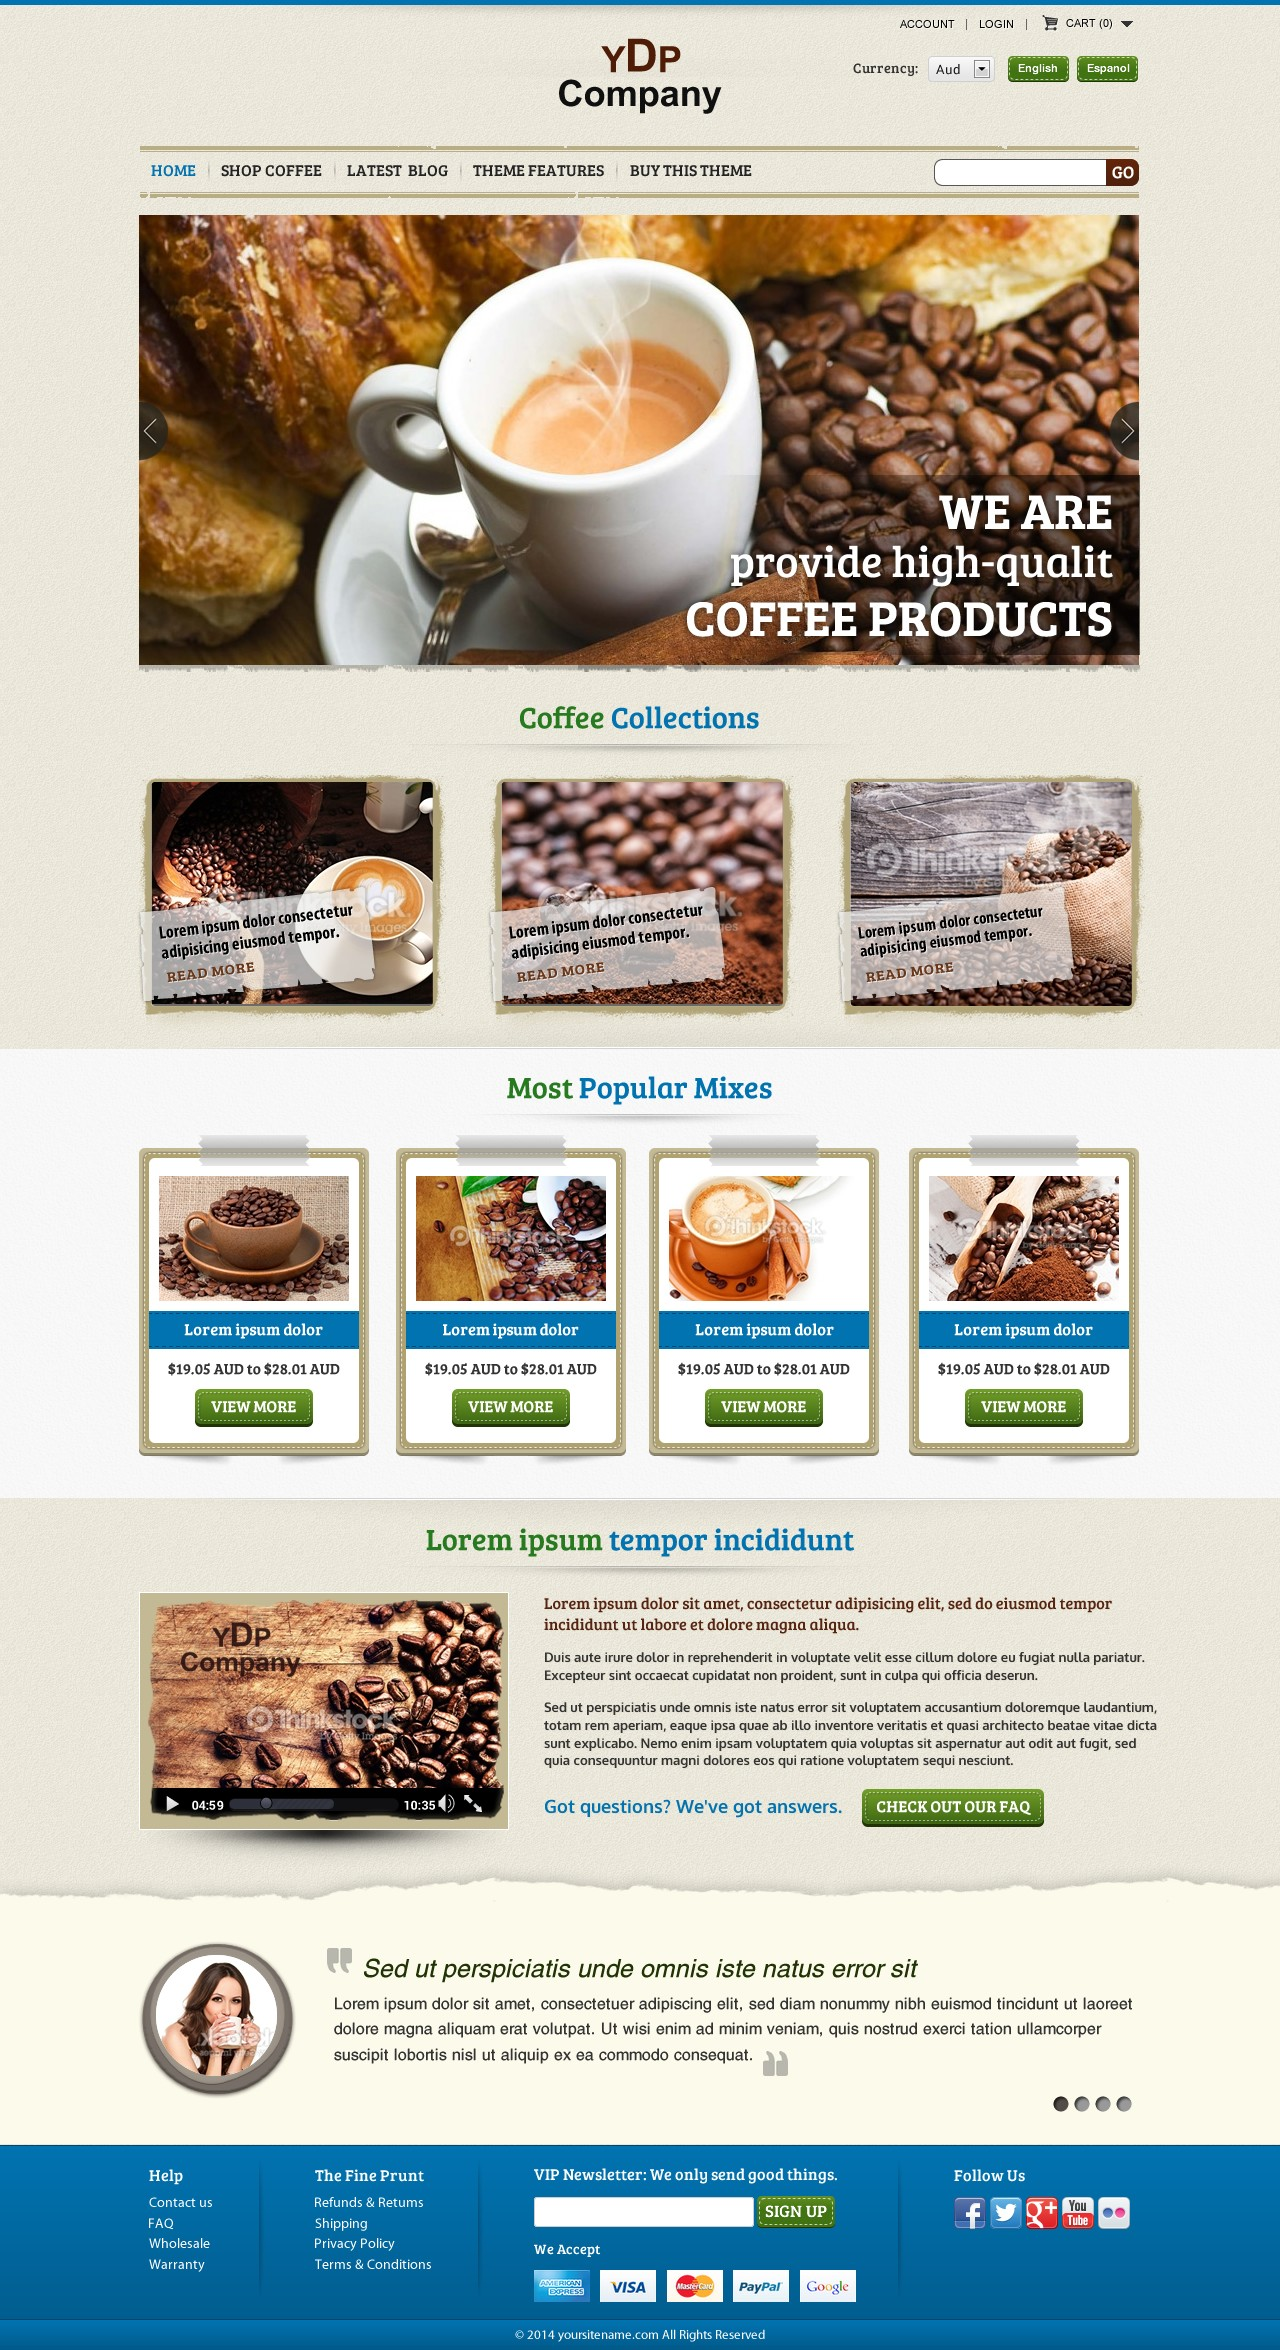 Web page design (CMS)